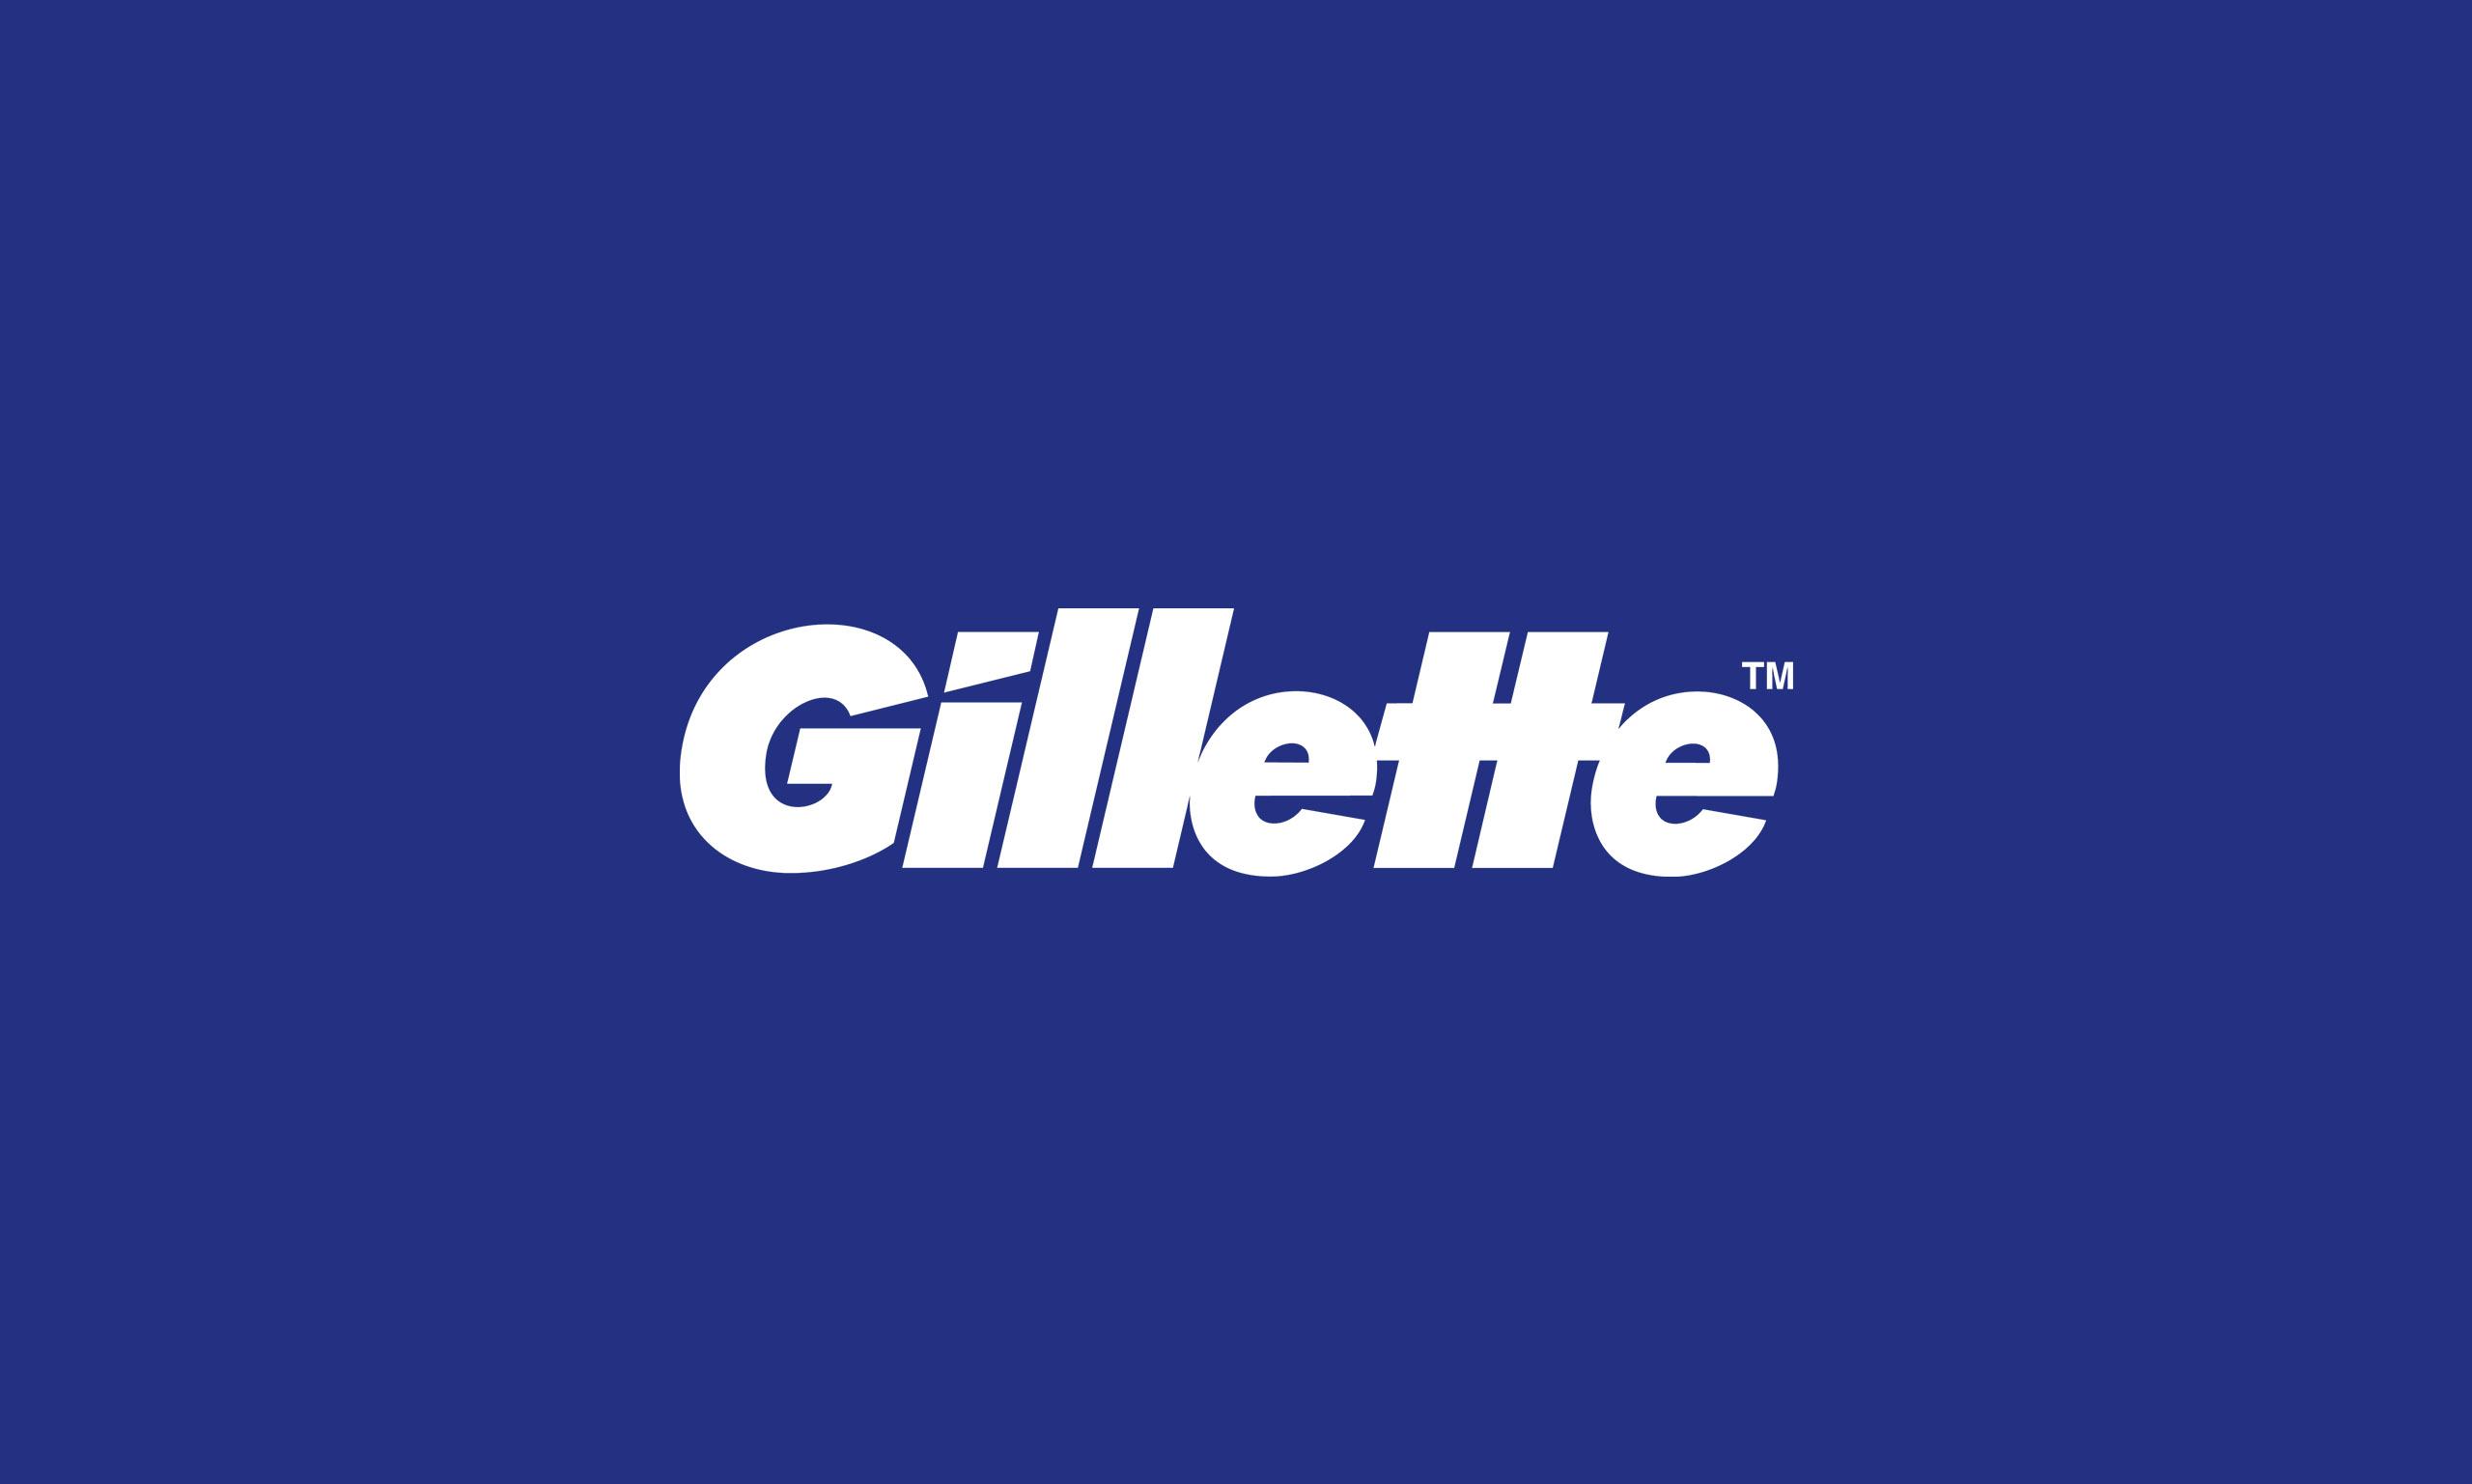 لوگوی Gillette